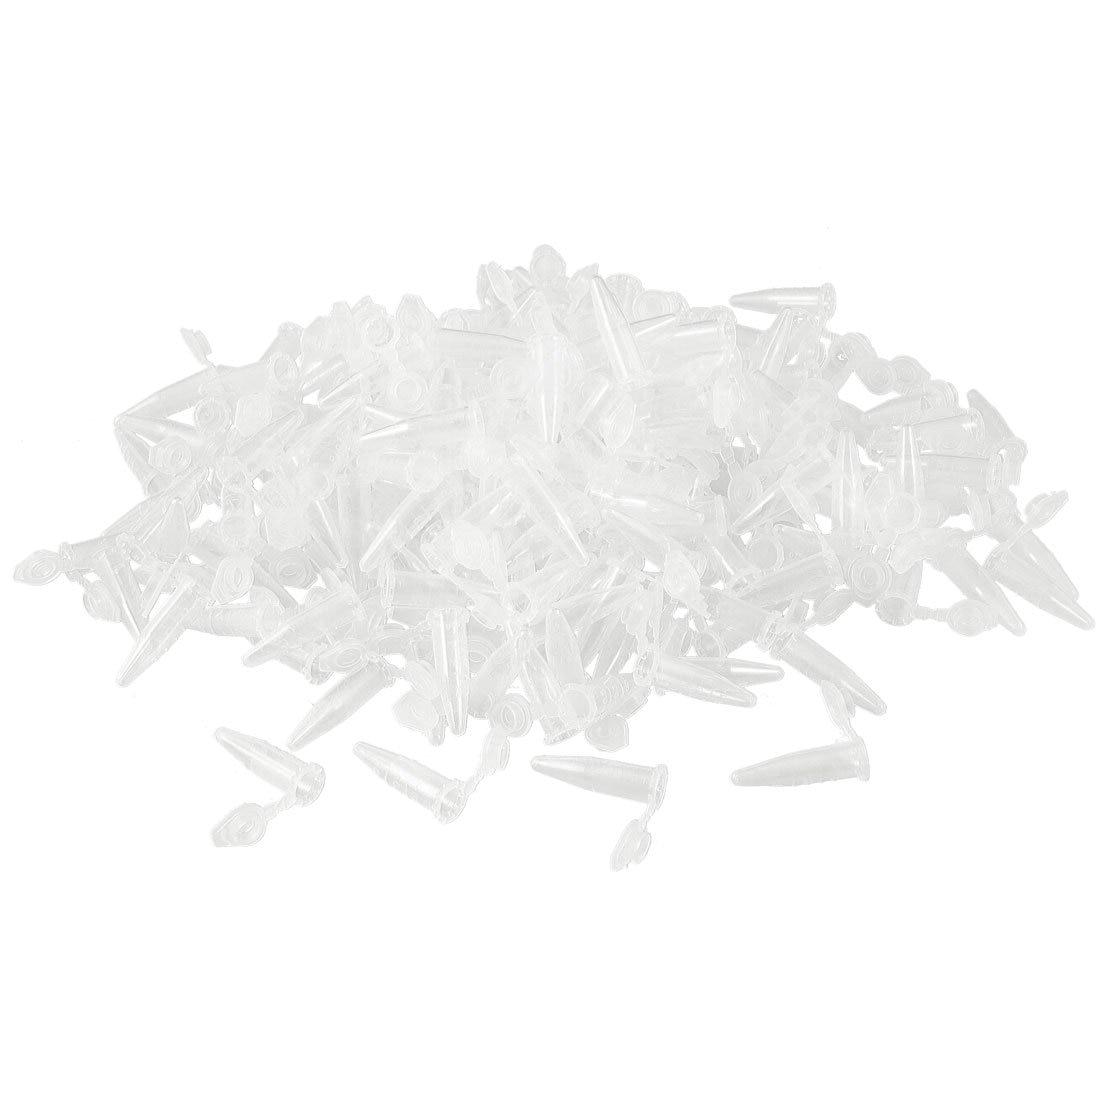 1000 Pcs Laboratory Clear White Mark Printed Plastic Centrifuge Tube 0.5ml1000 Pcs Laboratory Clear White Mark Printed Plastic Centrifuge Tube 0.5ml